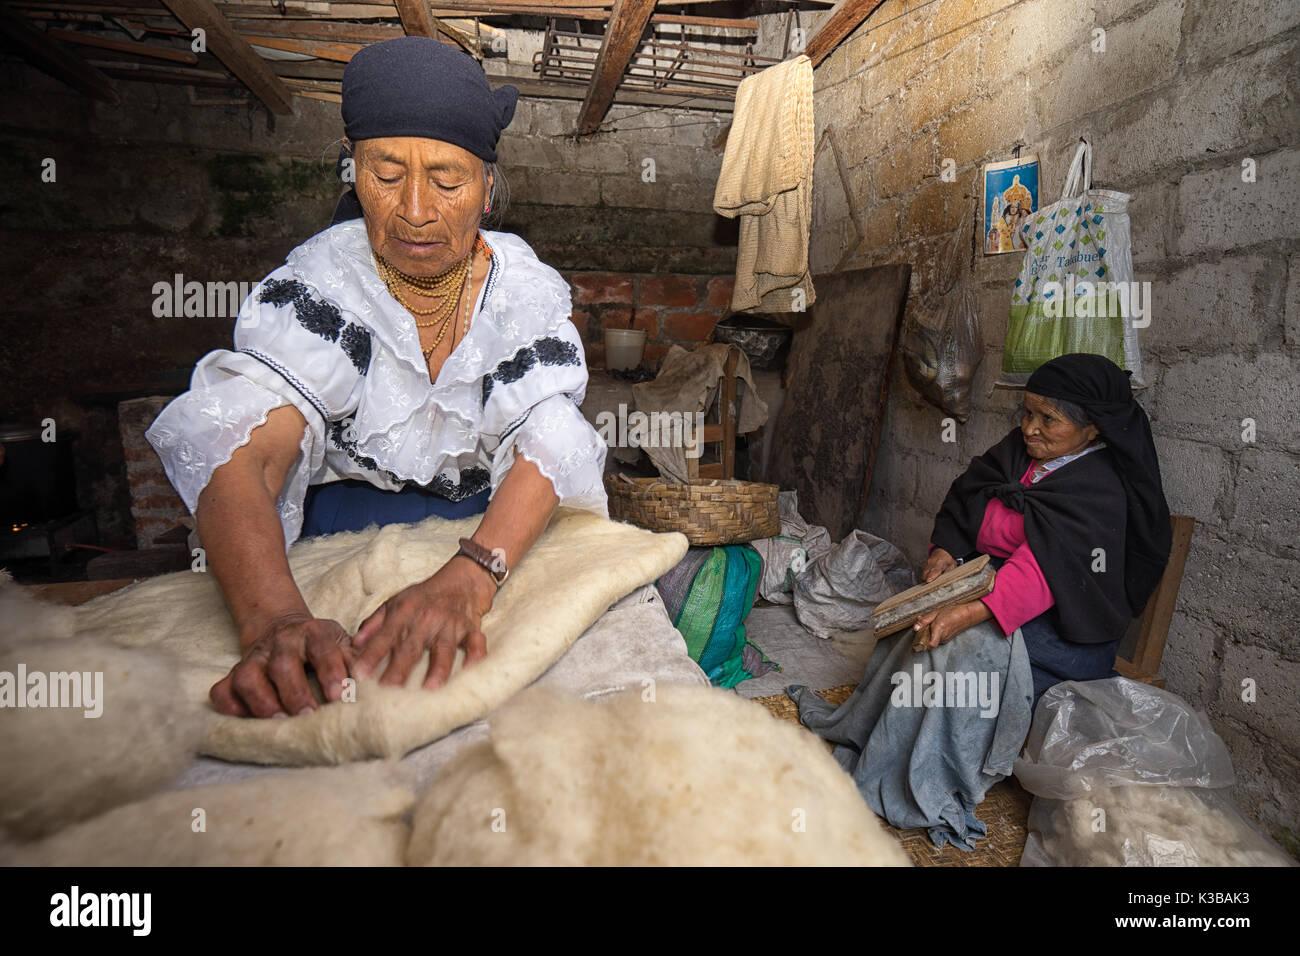 April 21, 2017 Iluman, Ecuador: kichwa indigenous women working at an artisan hat shop - Stock Image